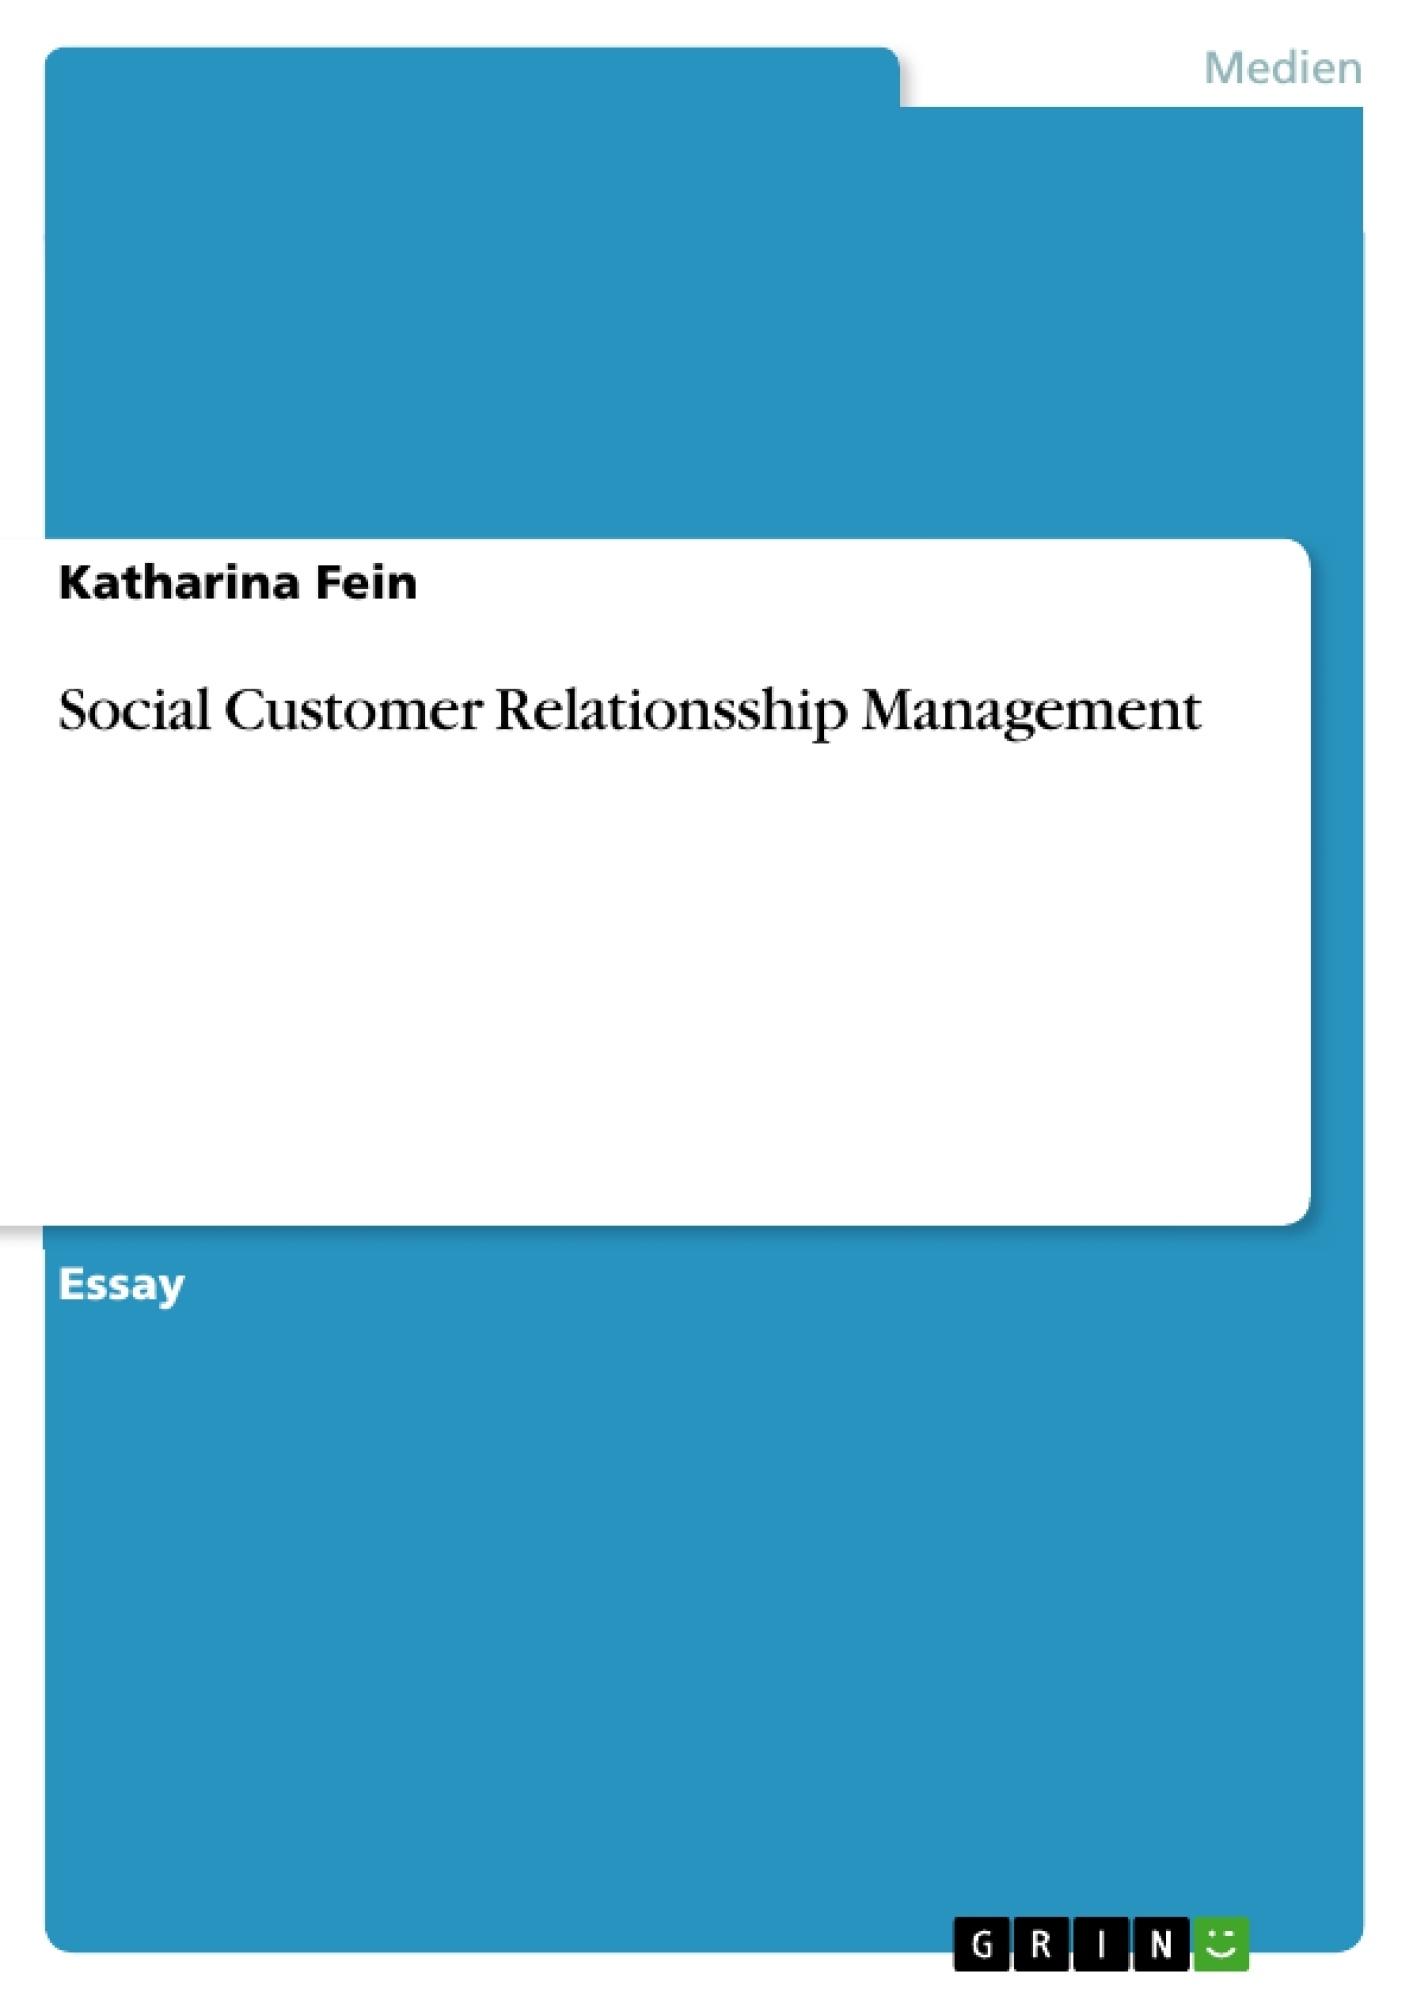 Titel: Social Customer Relationsship Management